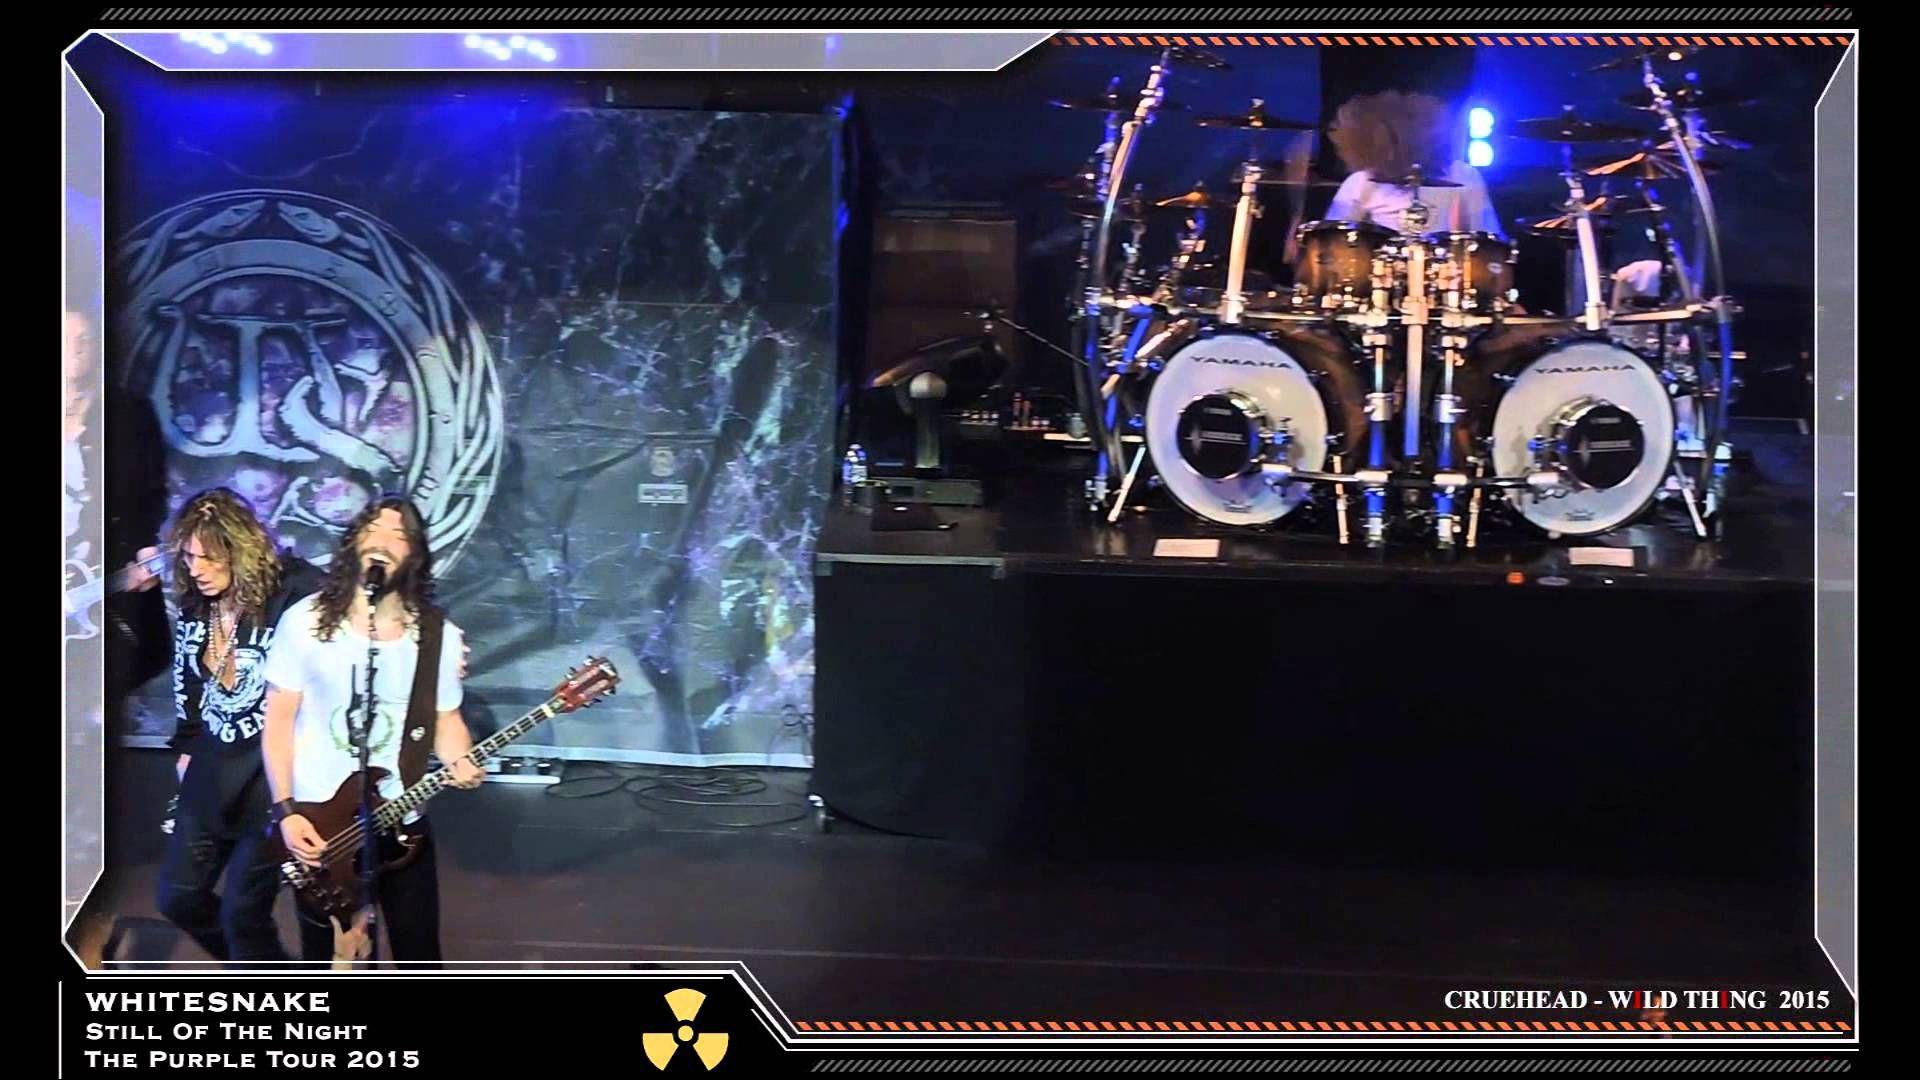 Whitesnake  - Still Of The Night  2015